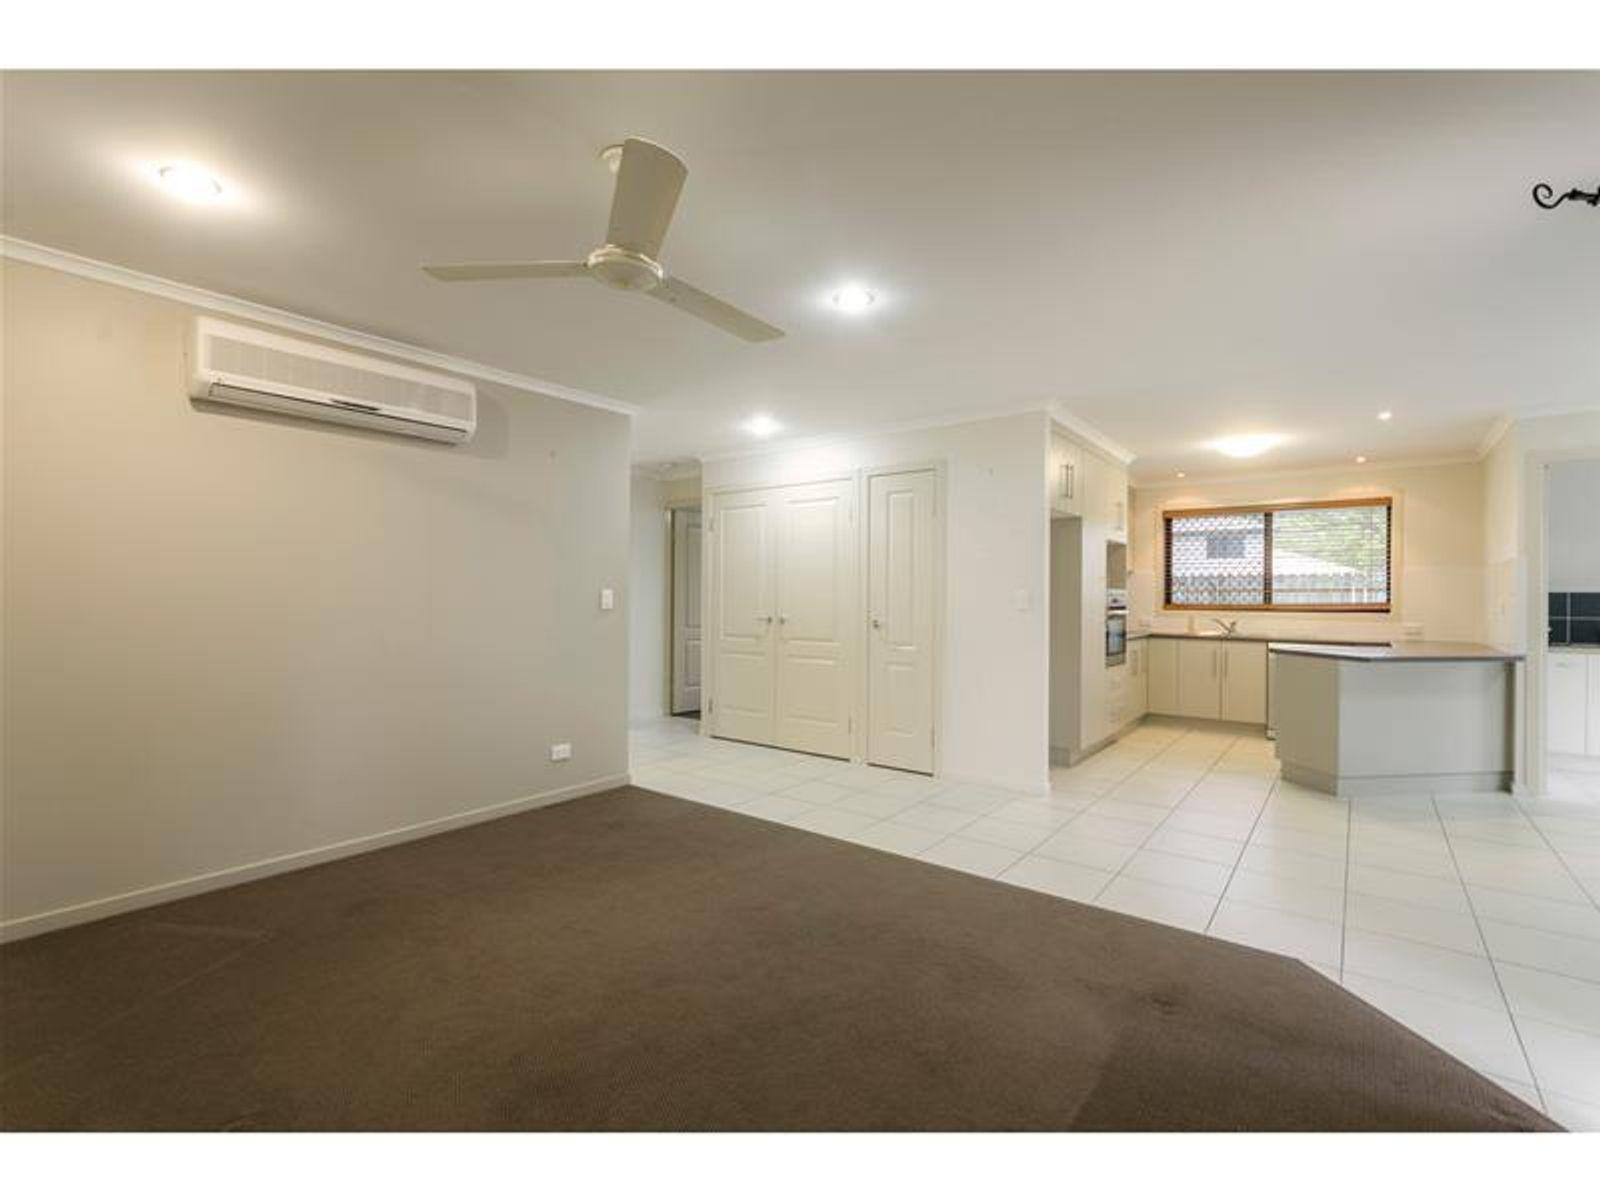 10/15A Avoca Street, Bundaberg West, QLD 4670